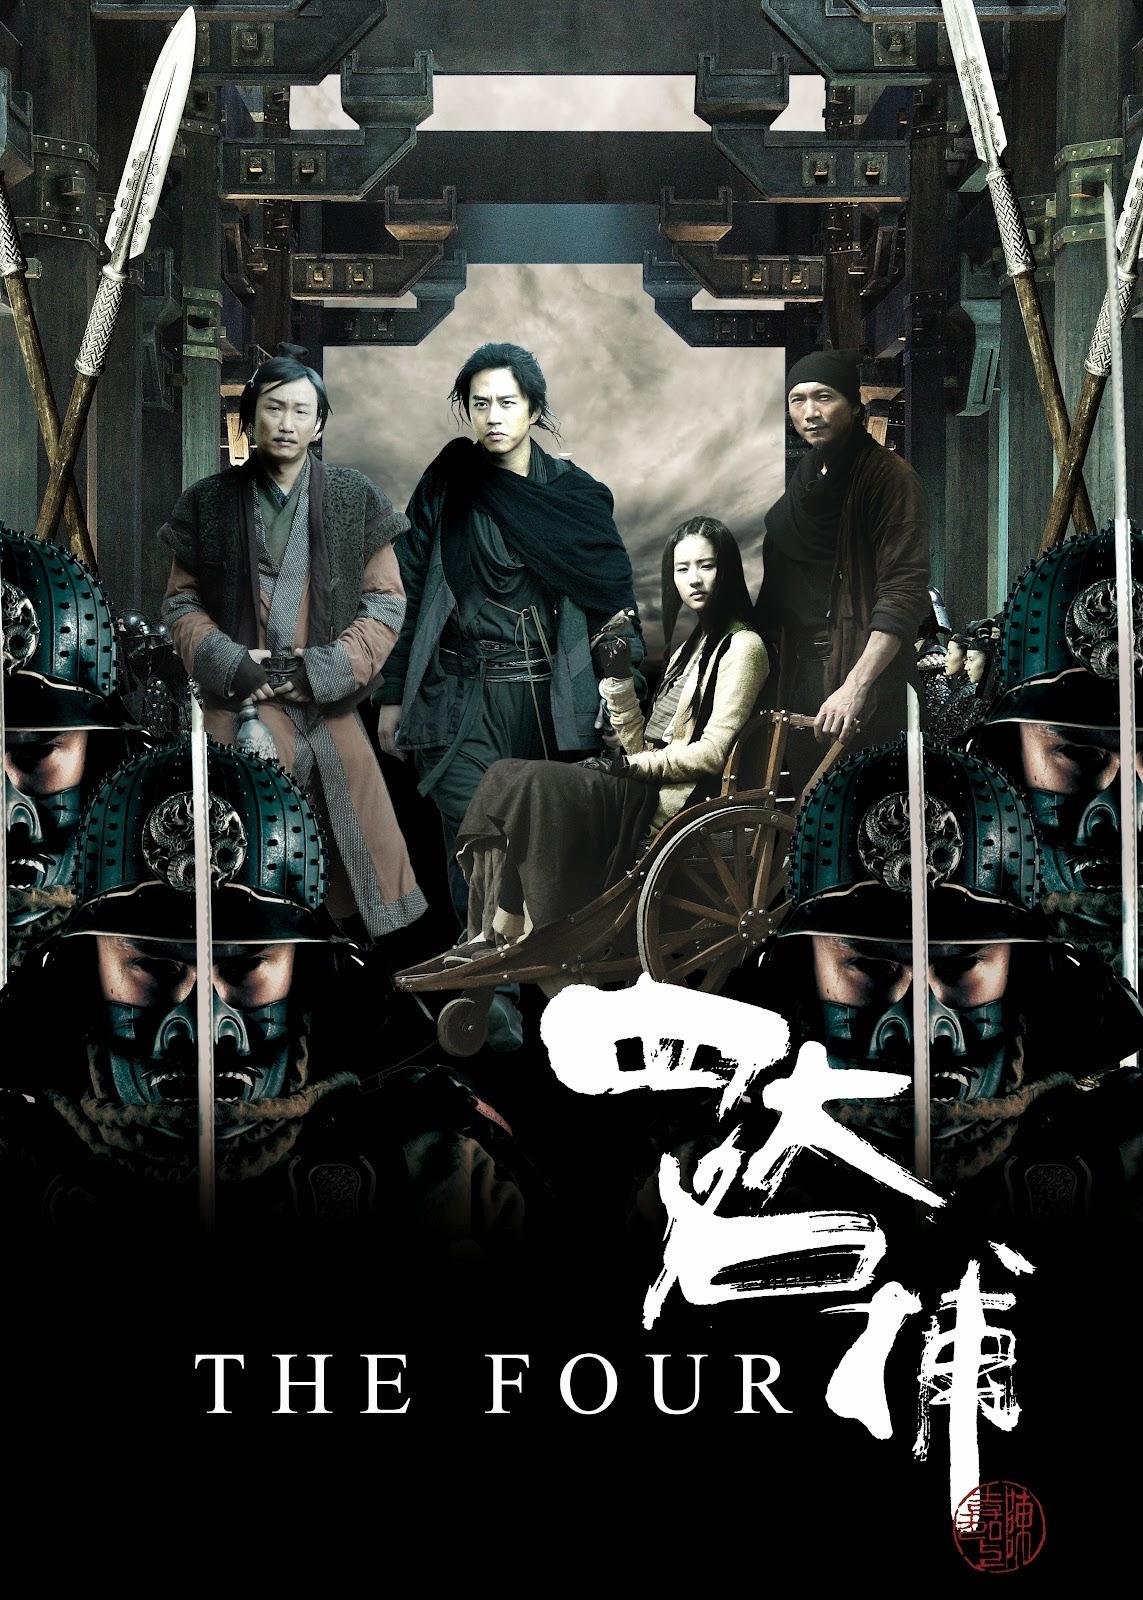 The Four 2012 (film)